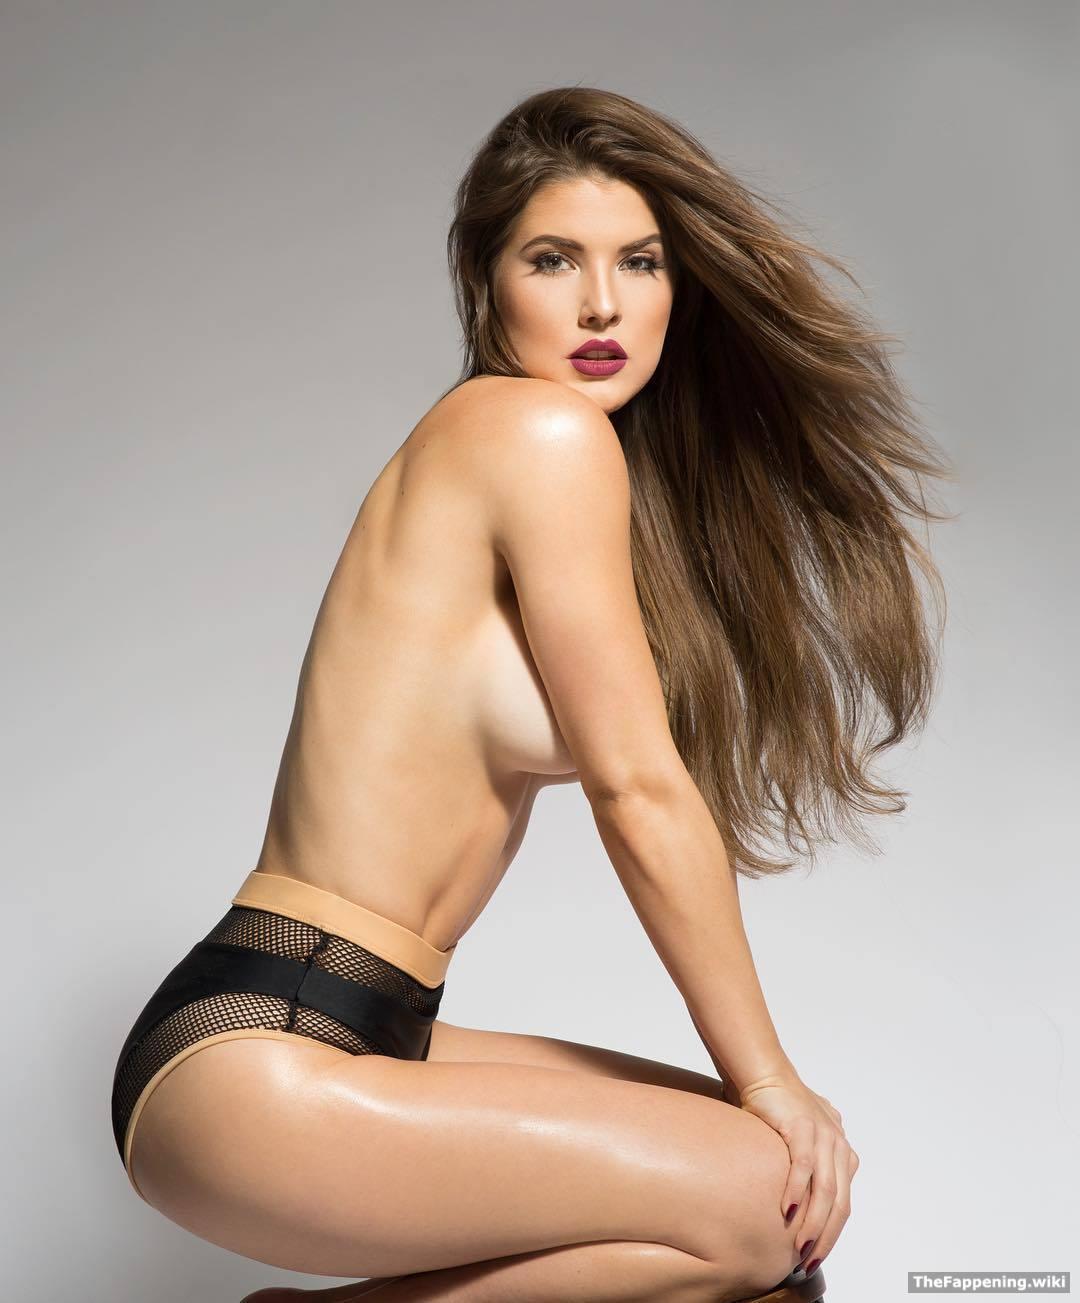 Amanda Cerny Video Porno amanda cerny nude pics & vids - the fappening